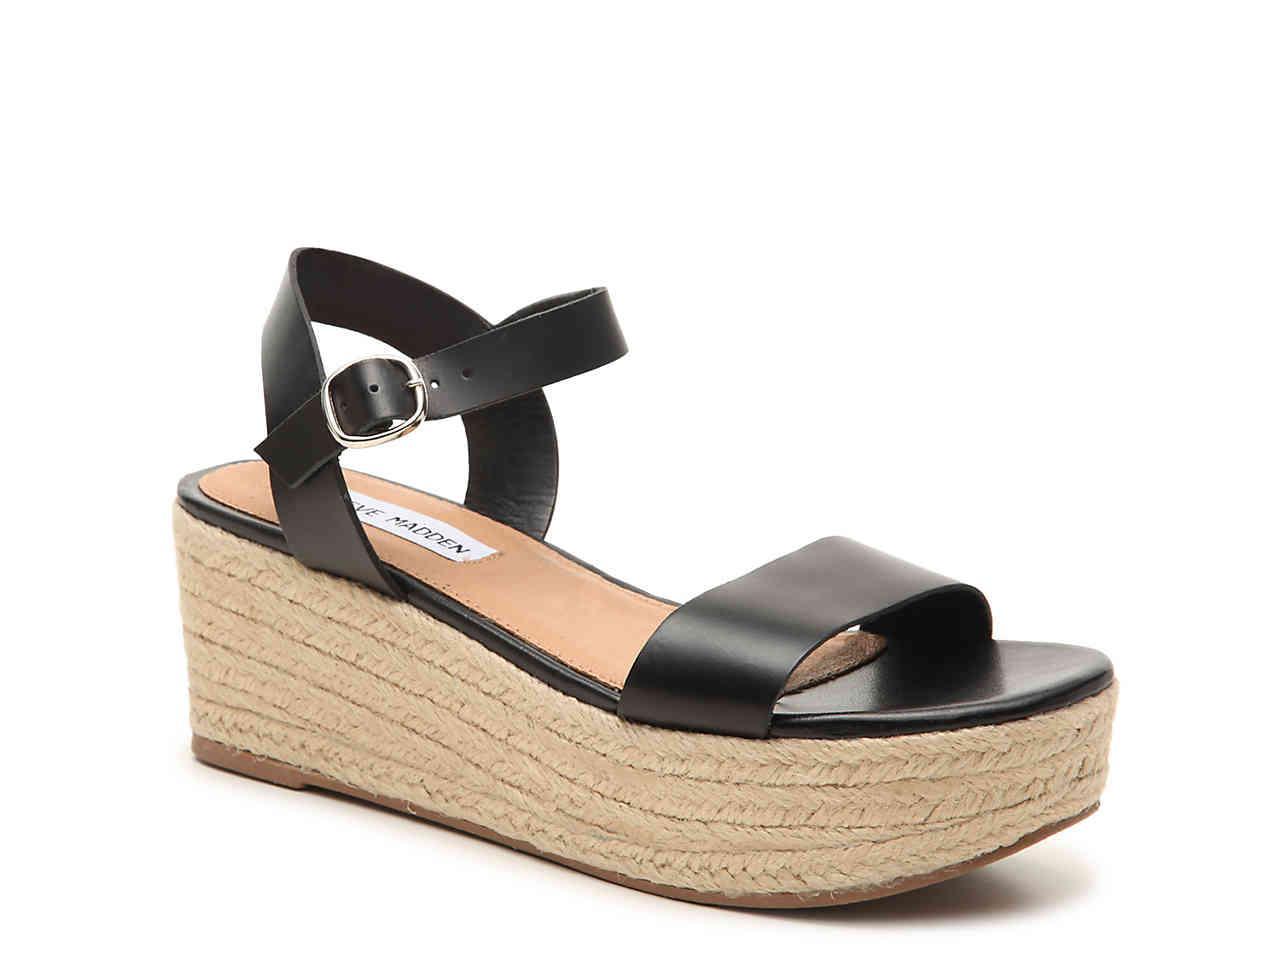 31c2798bcf5 Women's Black Brandice Espadrille Wedge Sandal